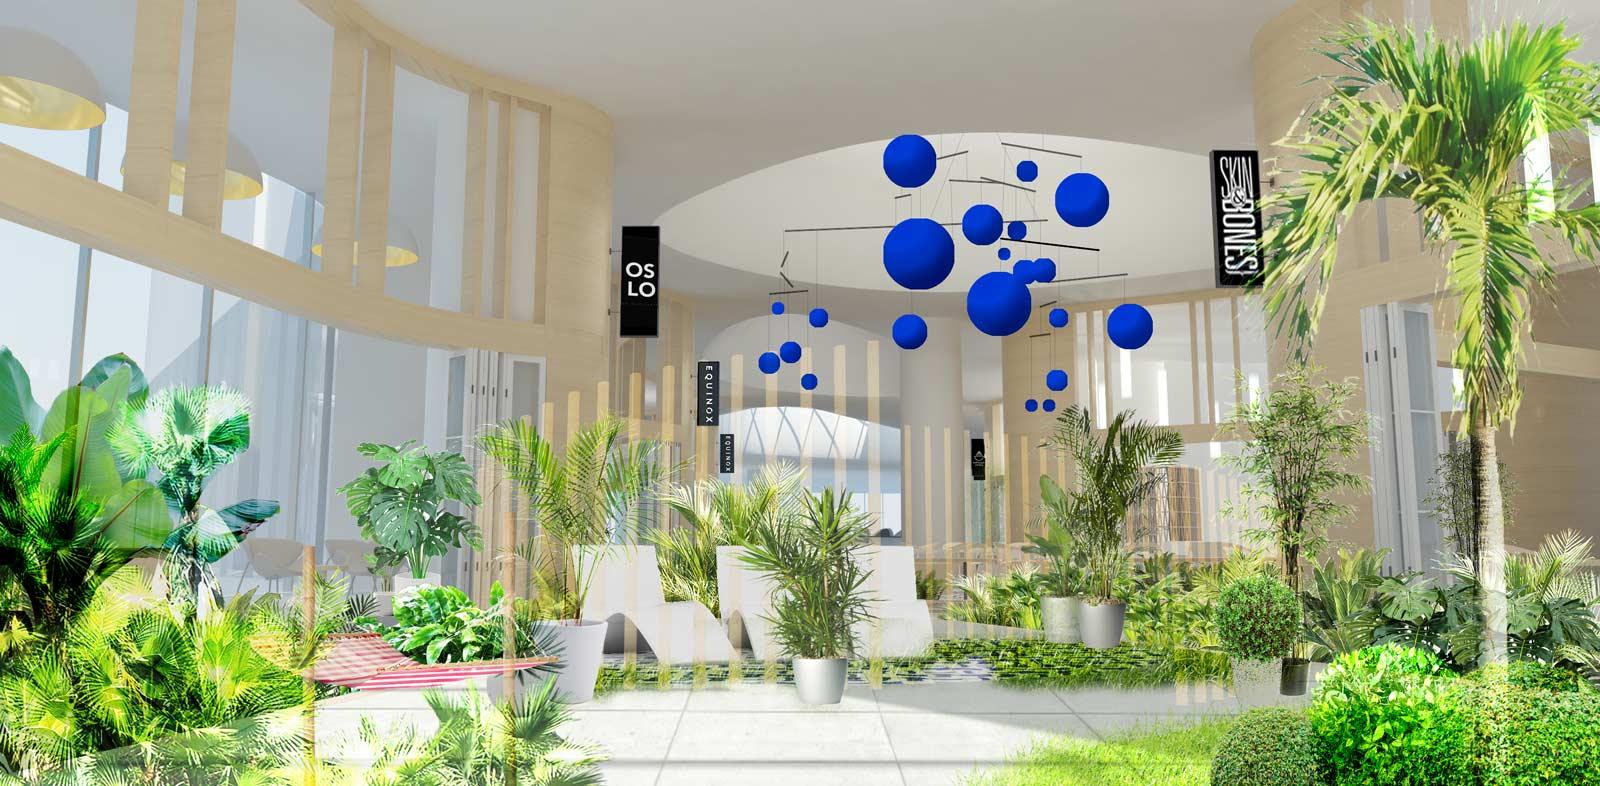 ACDO / Central Embassy